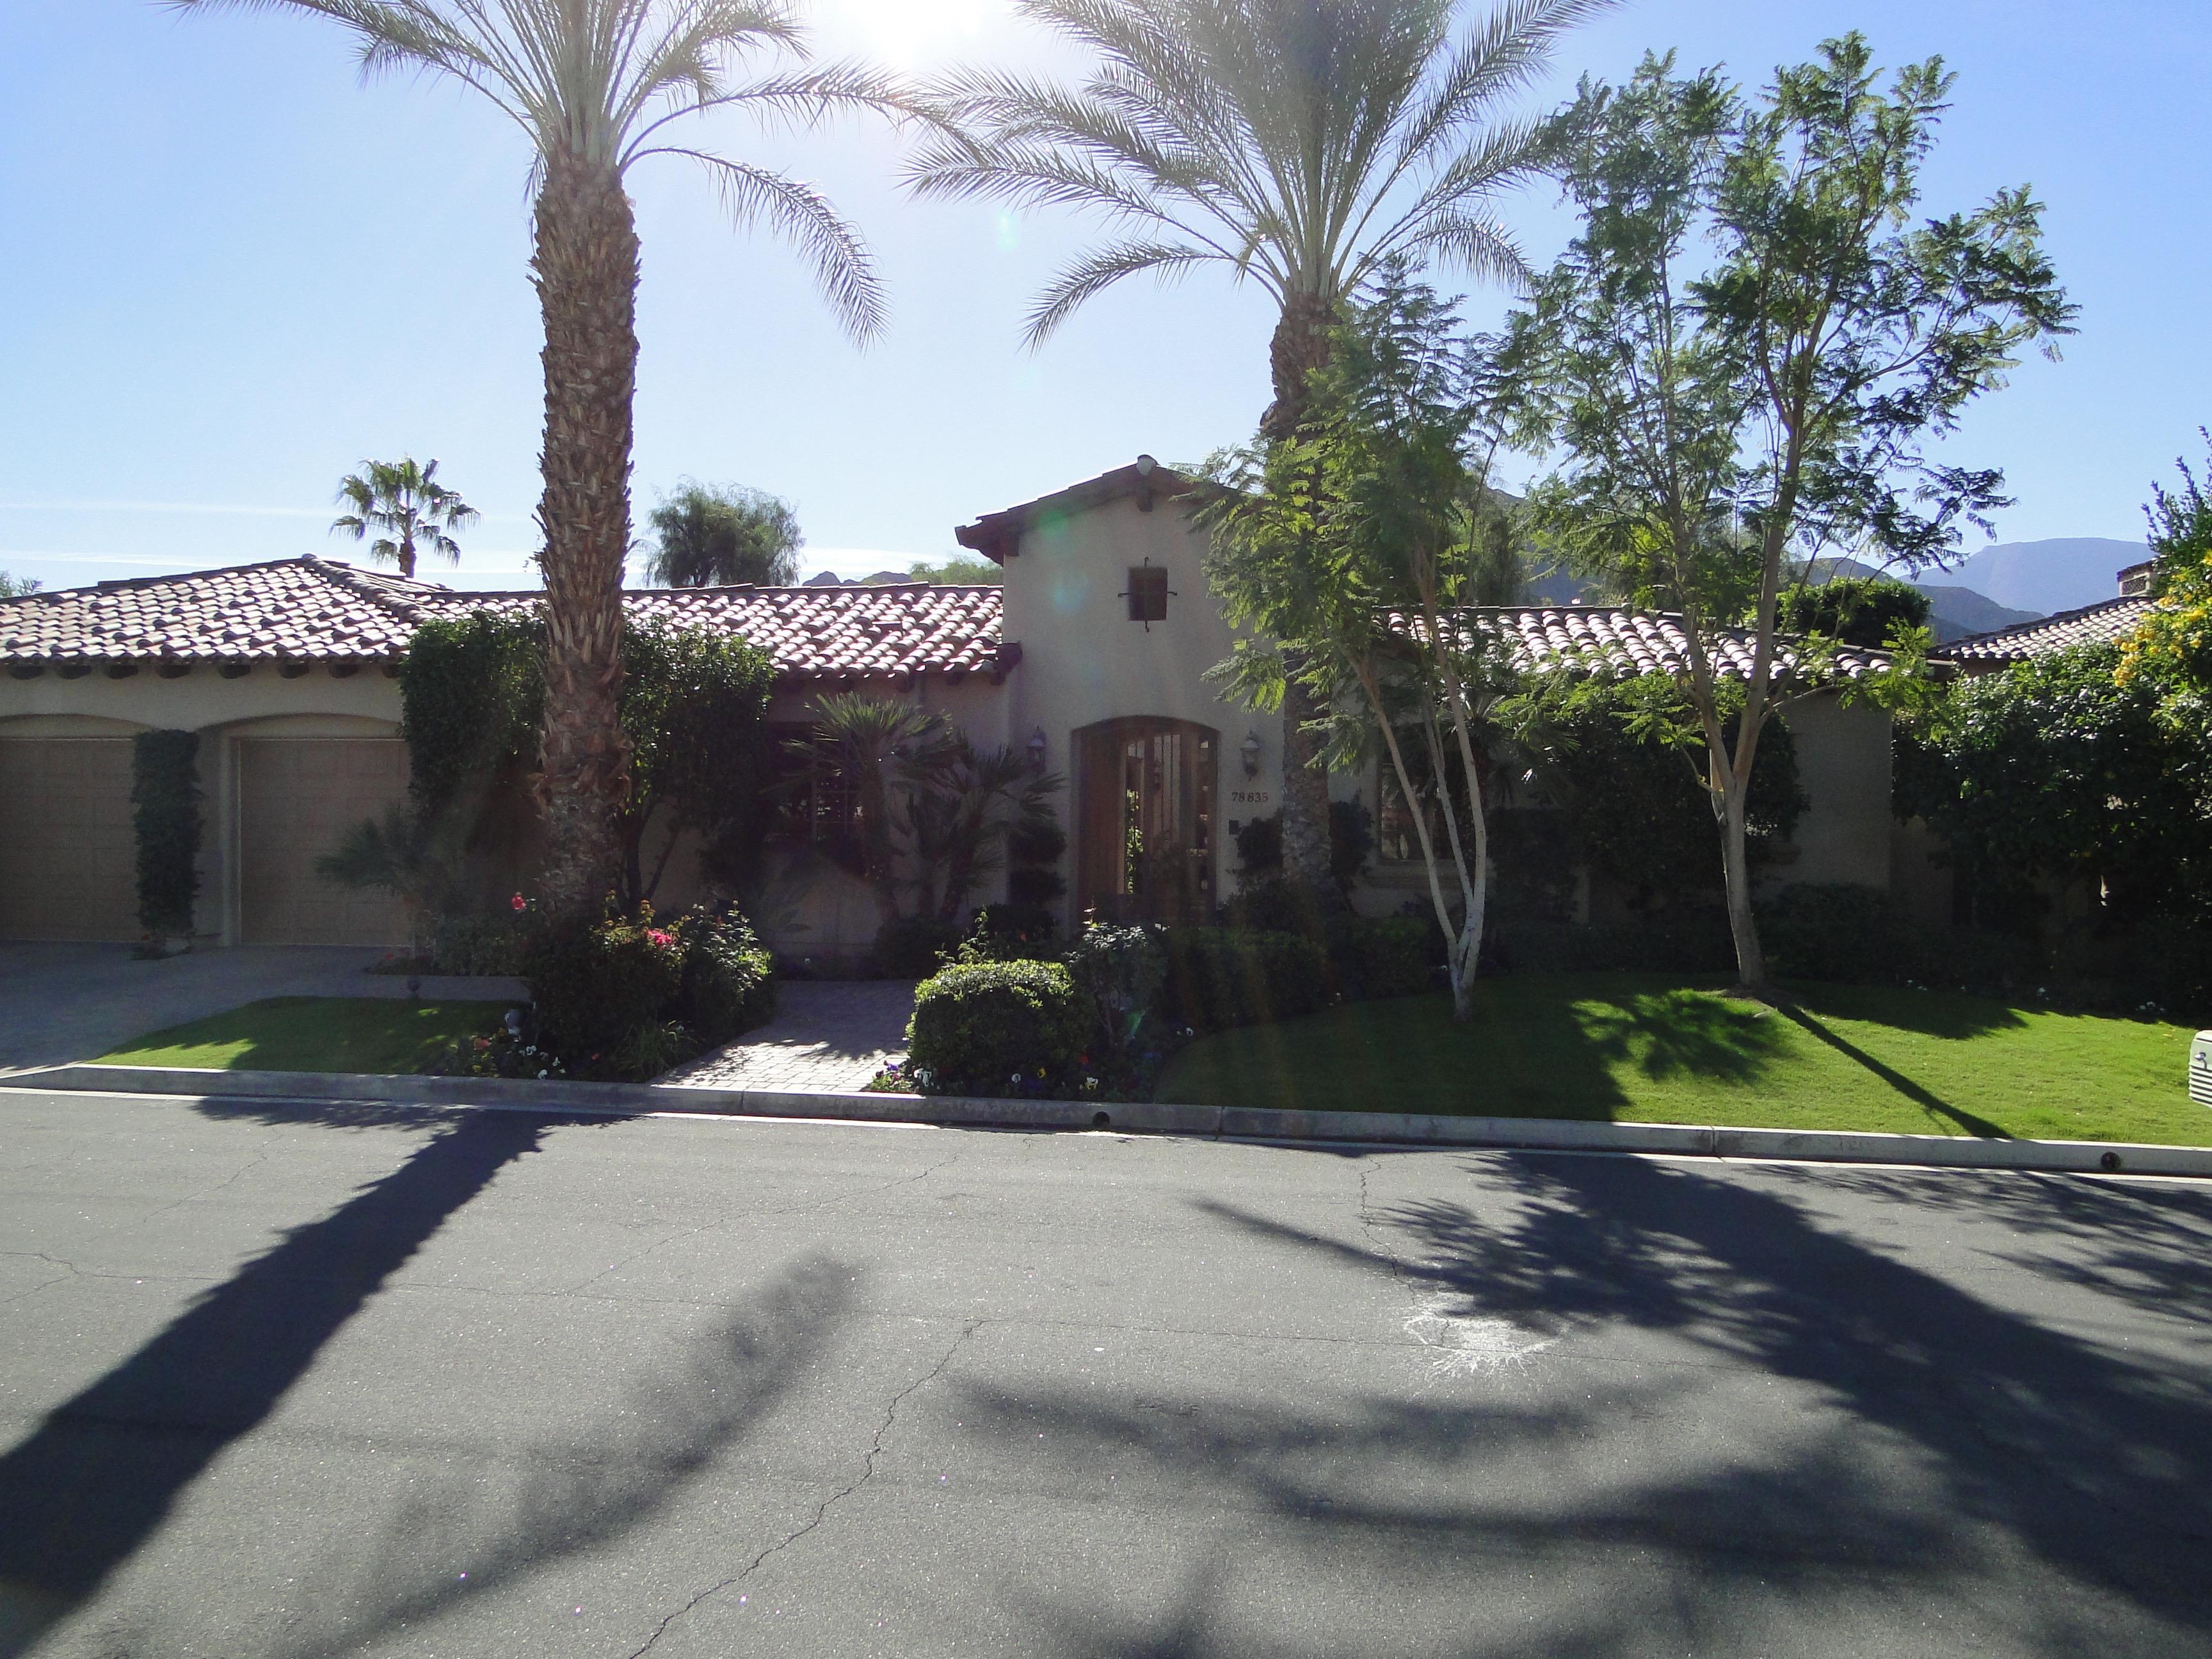 Single Family Home for Sale at 78835 Pina La Quinta, California, 92253 United States